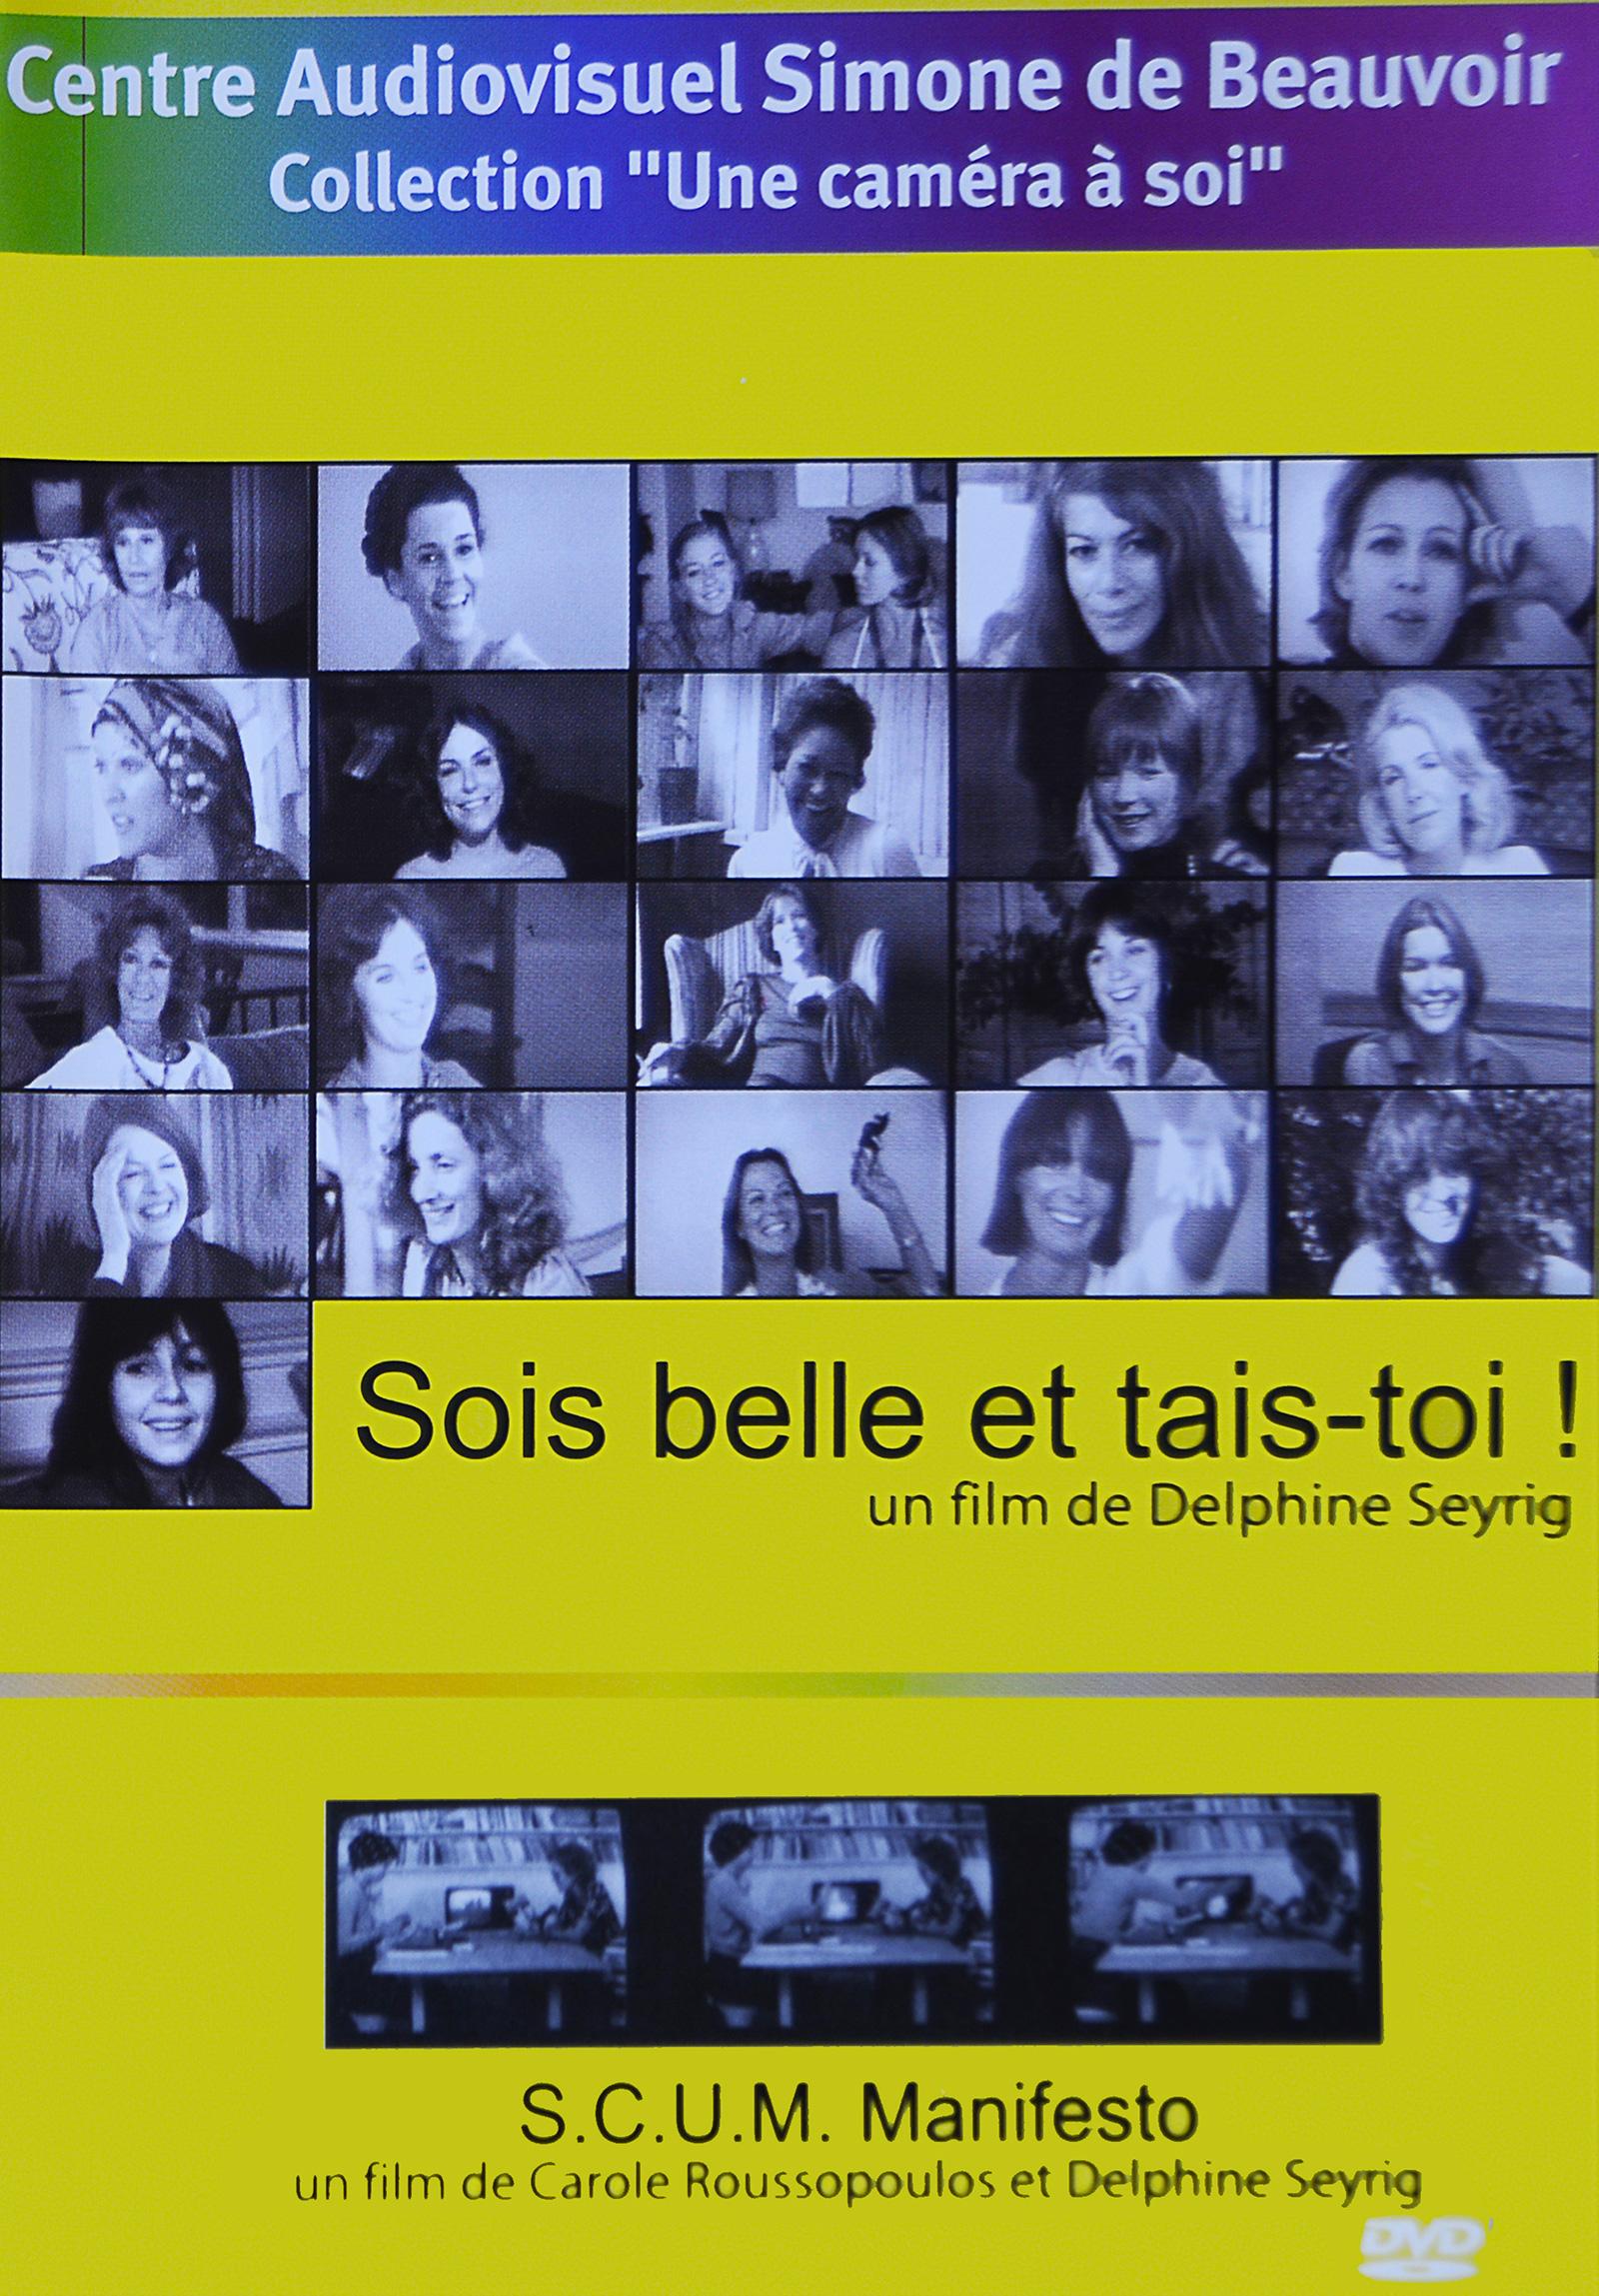 DVD «Sois belle et tais-toi ! & S.C.U.M. Manifesto»